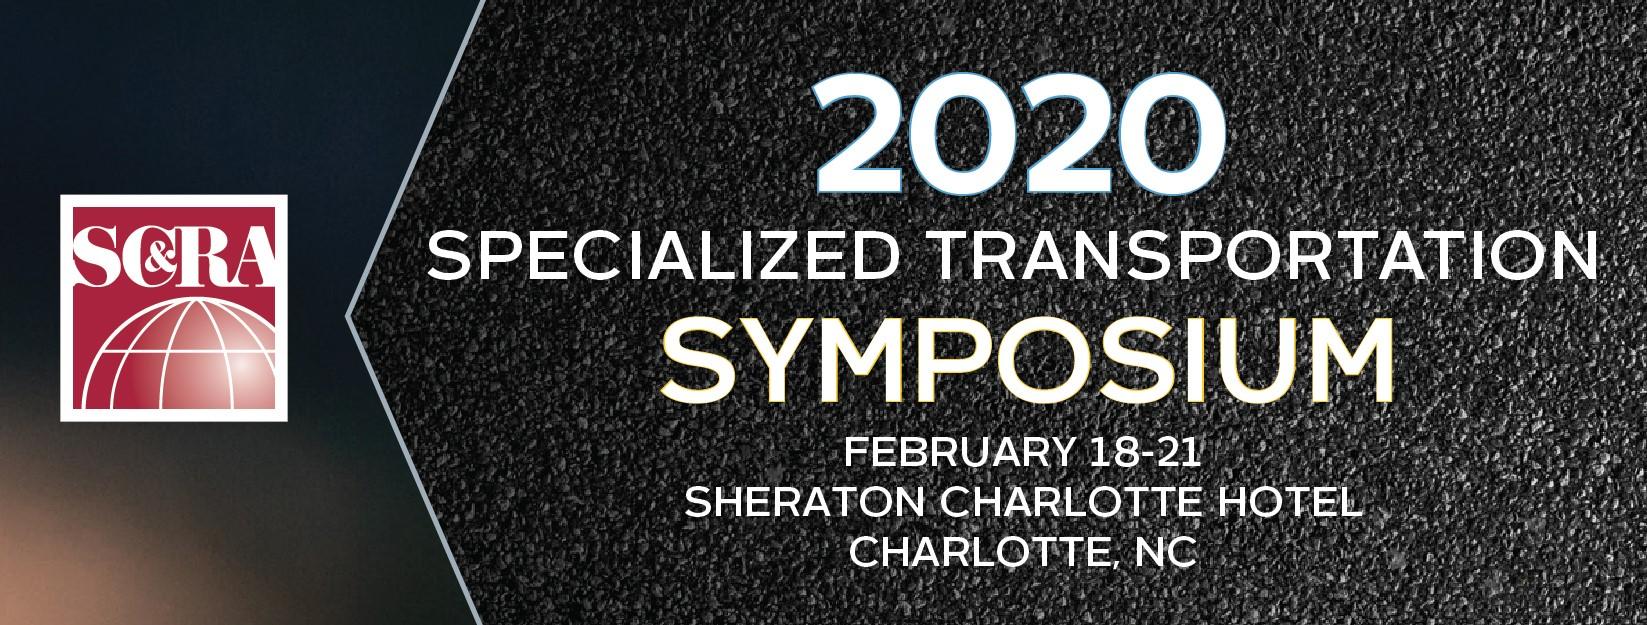 2020 Specialized Transportation Symposium